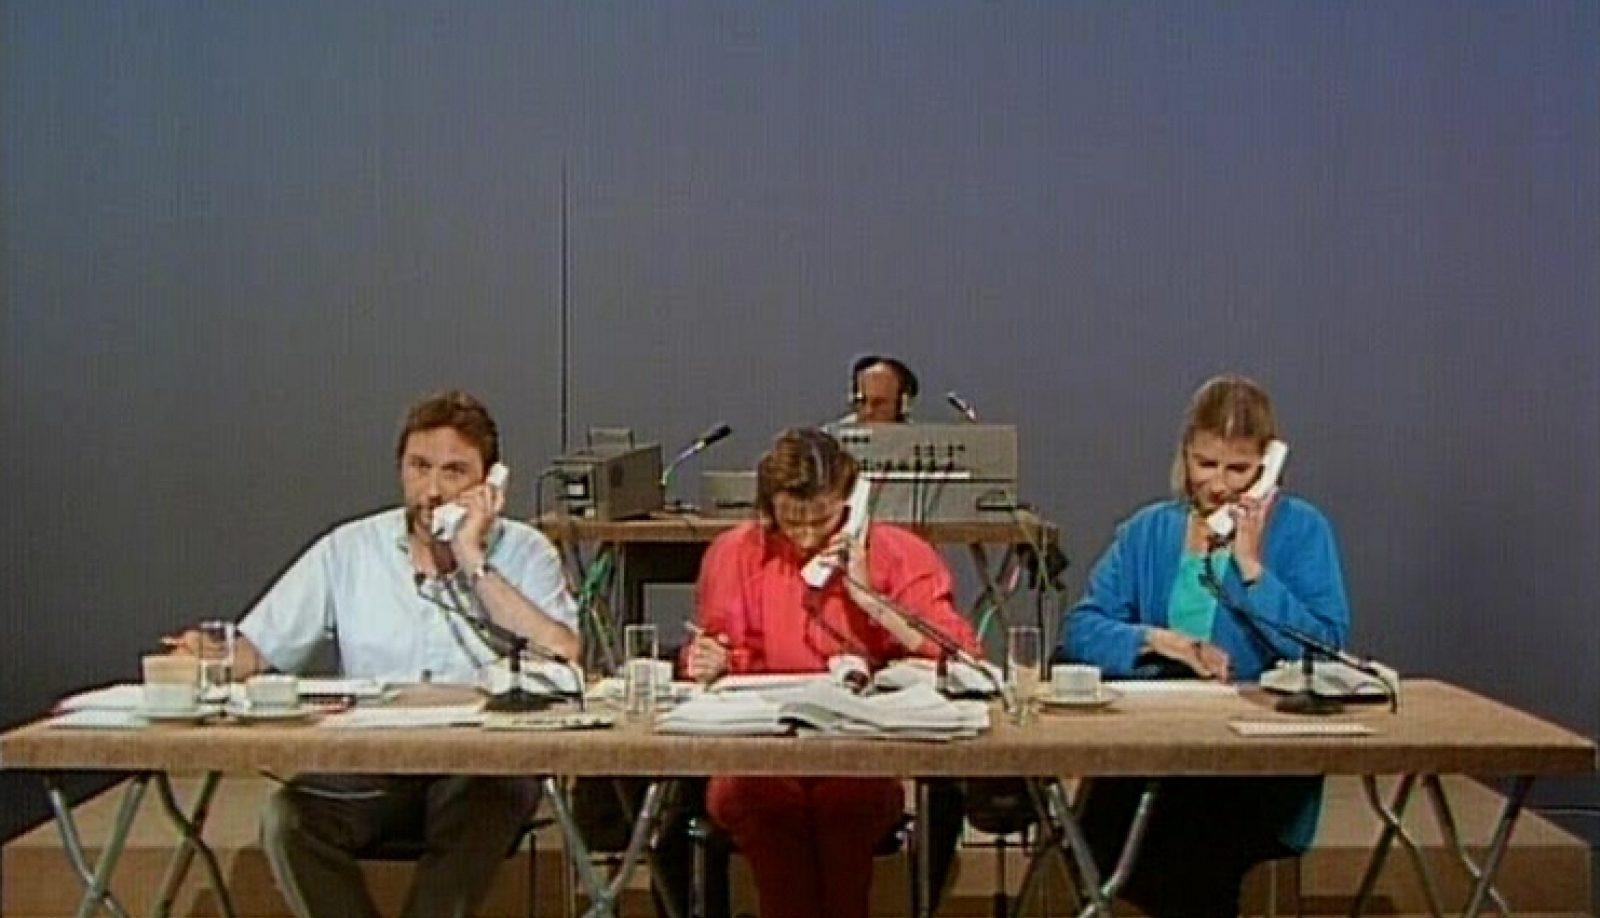 Jef Cornelis, De Langste Dag (The Longest Day) (1986). ©VRT.